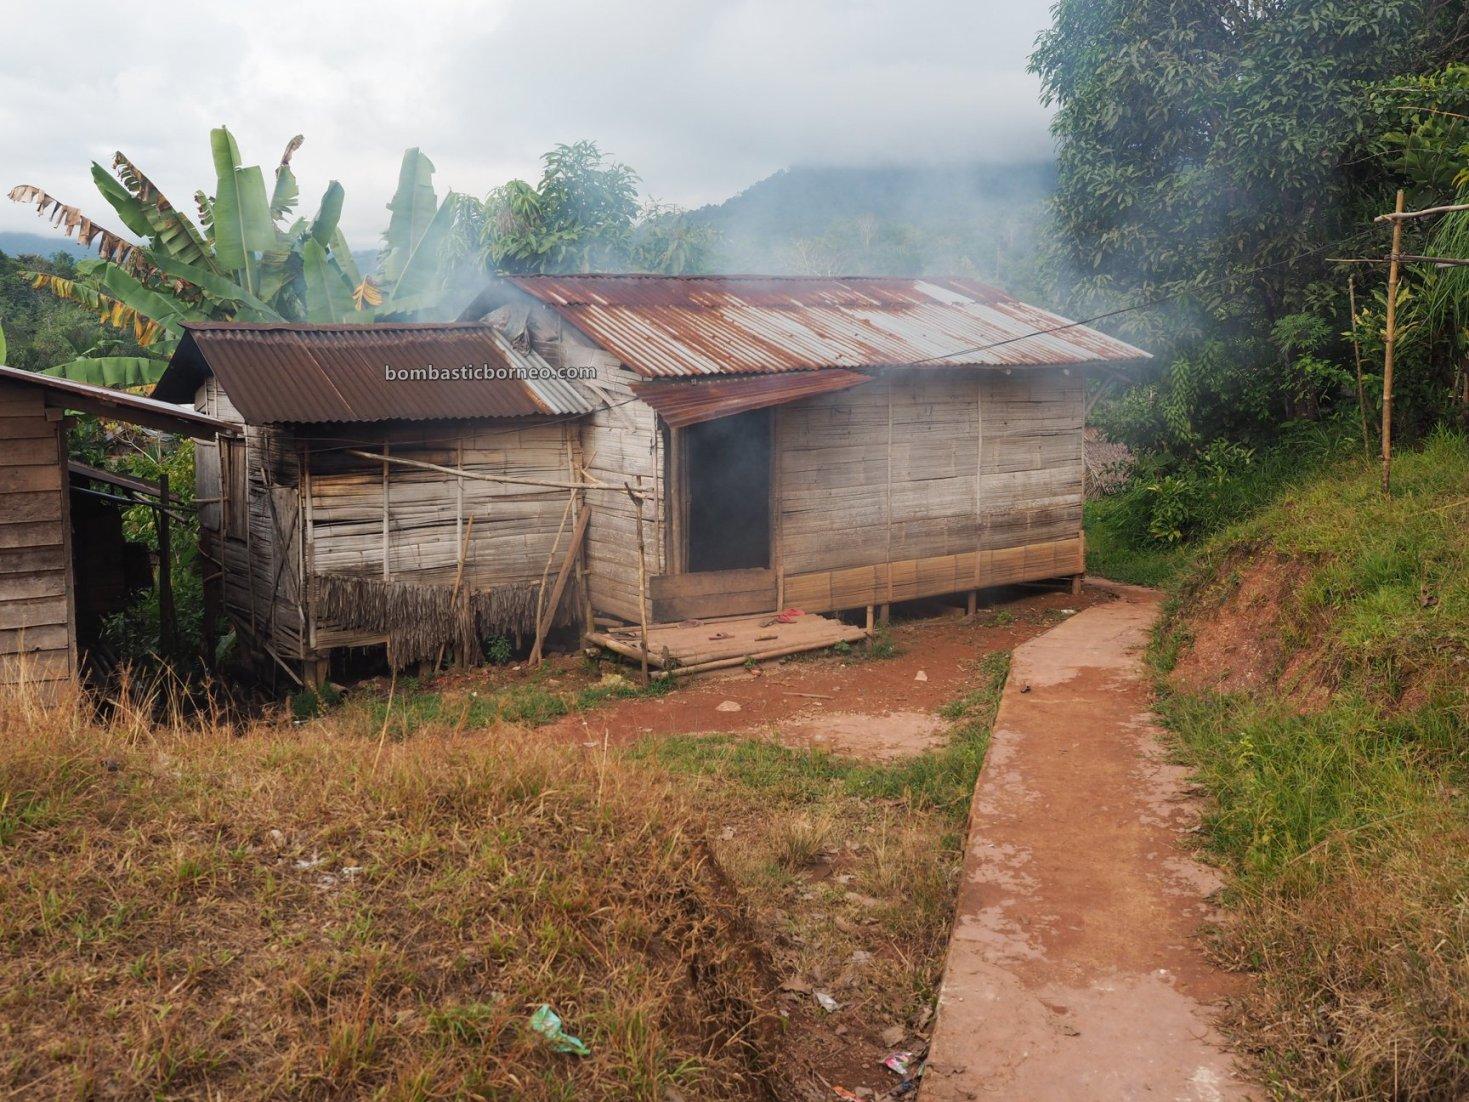 Desa Tamong, authentic, Traditional, village, destination, Indonesia, West Kalimantan, Bengkayang, Siding, ethnic, native, Dayak Bidayuh, travel guide, Borneo, Trans Border,